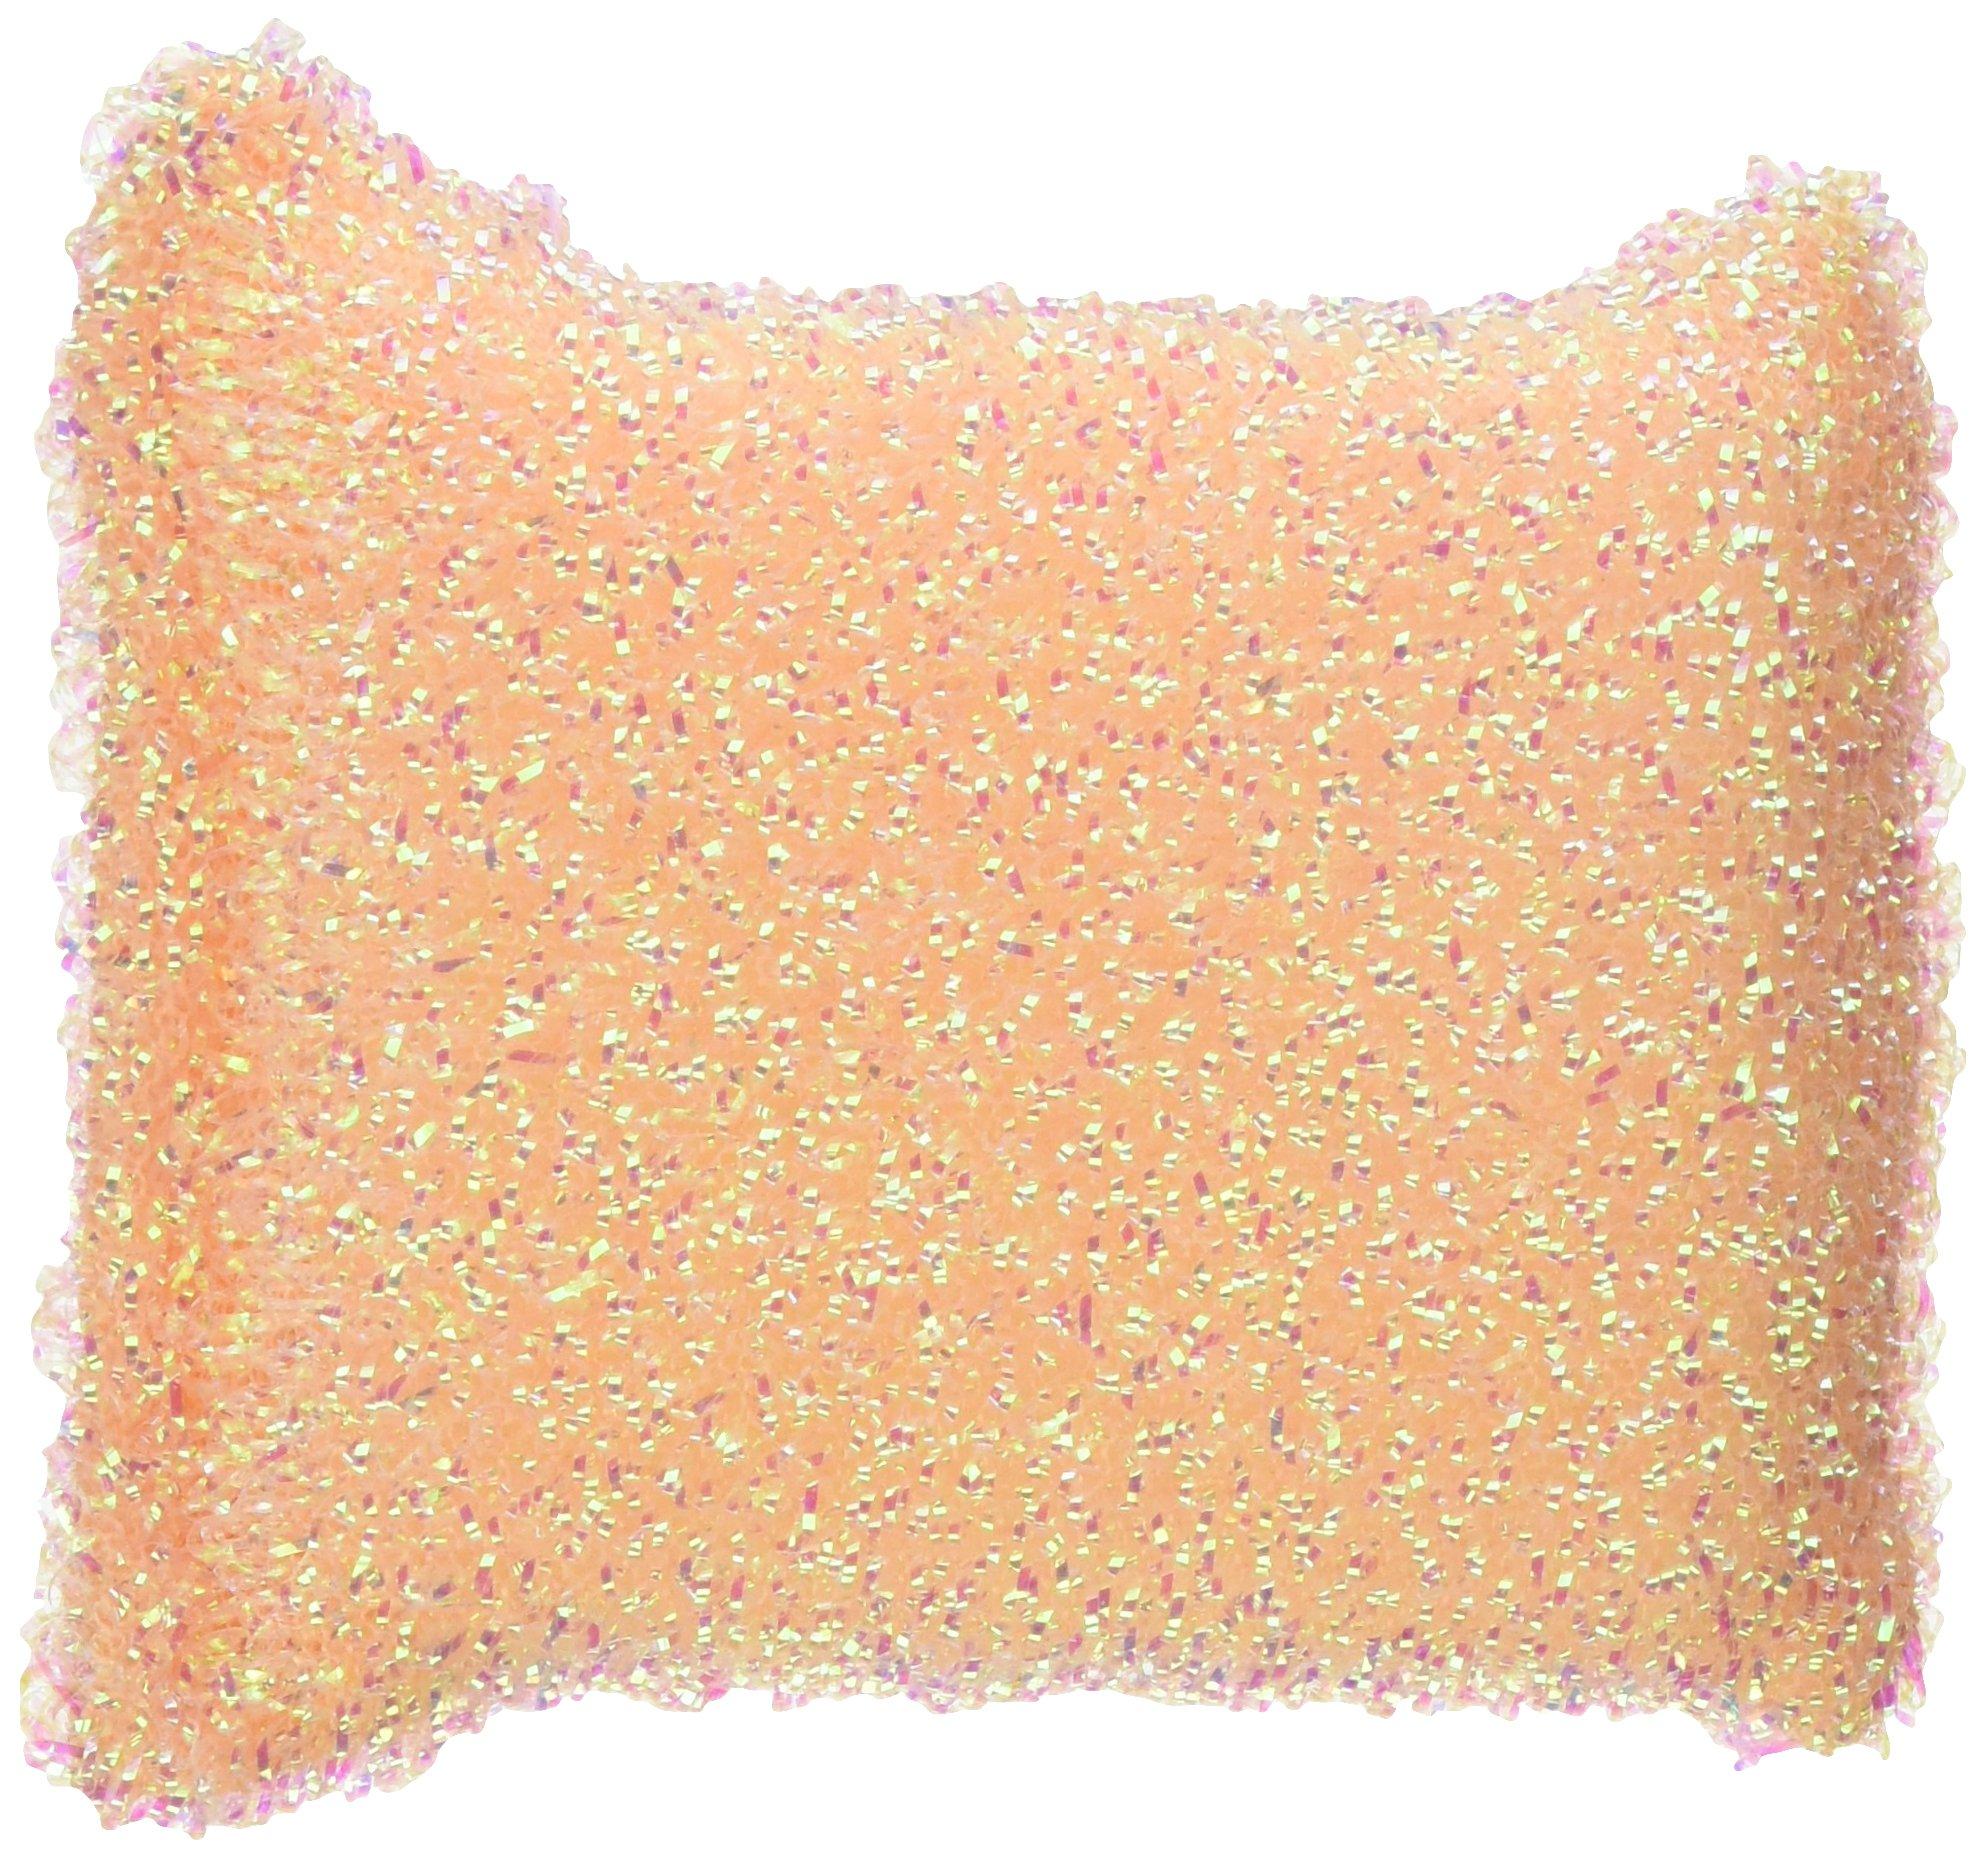 Casabella Sparkle Scrub Sponge, 2-Pack, Colors vary between Plum, Lime and Orange